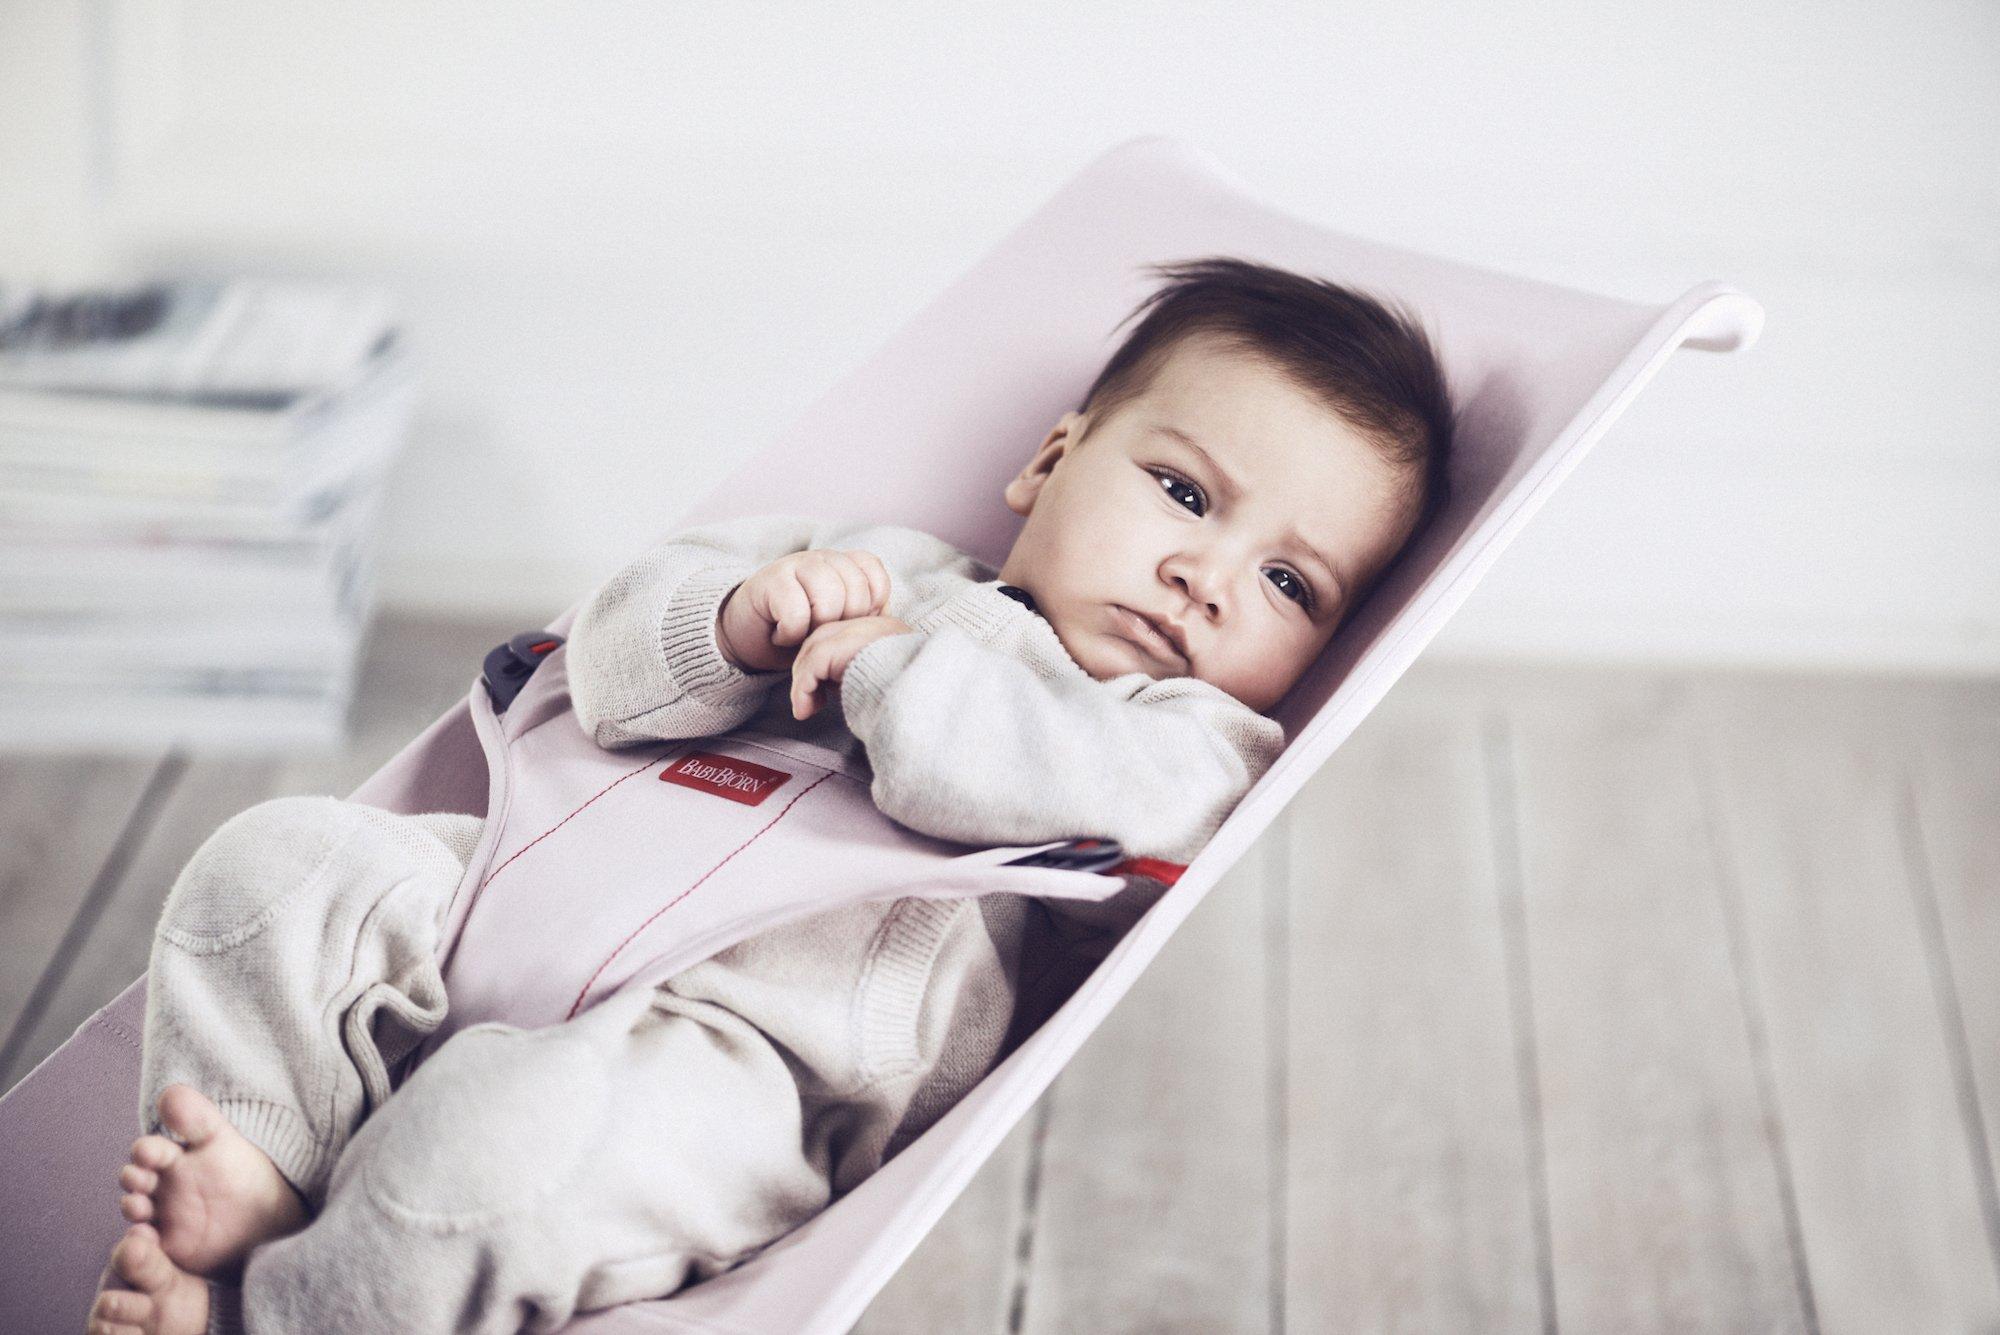 BabyBjorn Mini Cotton Bouncer, Gray/Jersey by BabyBjörn (Image #8)